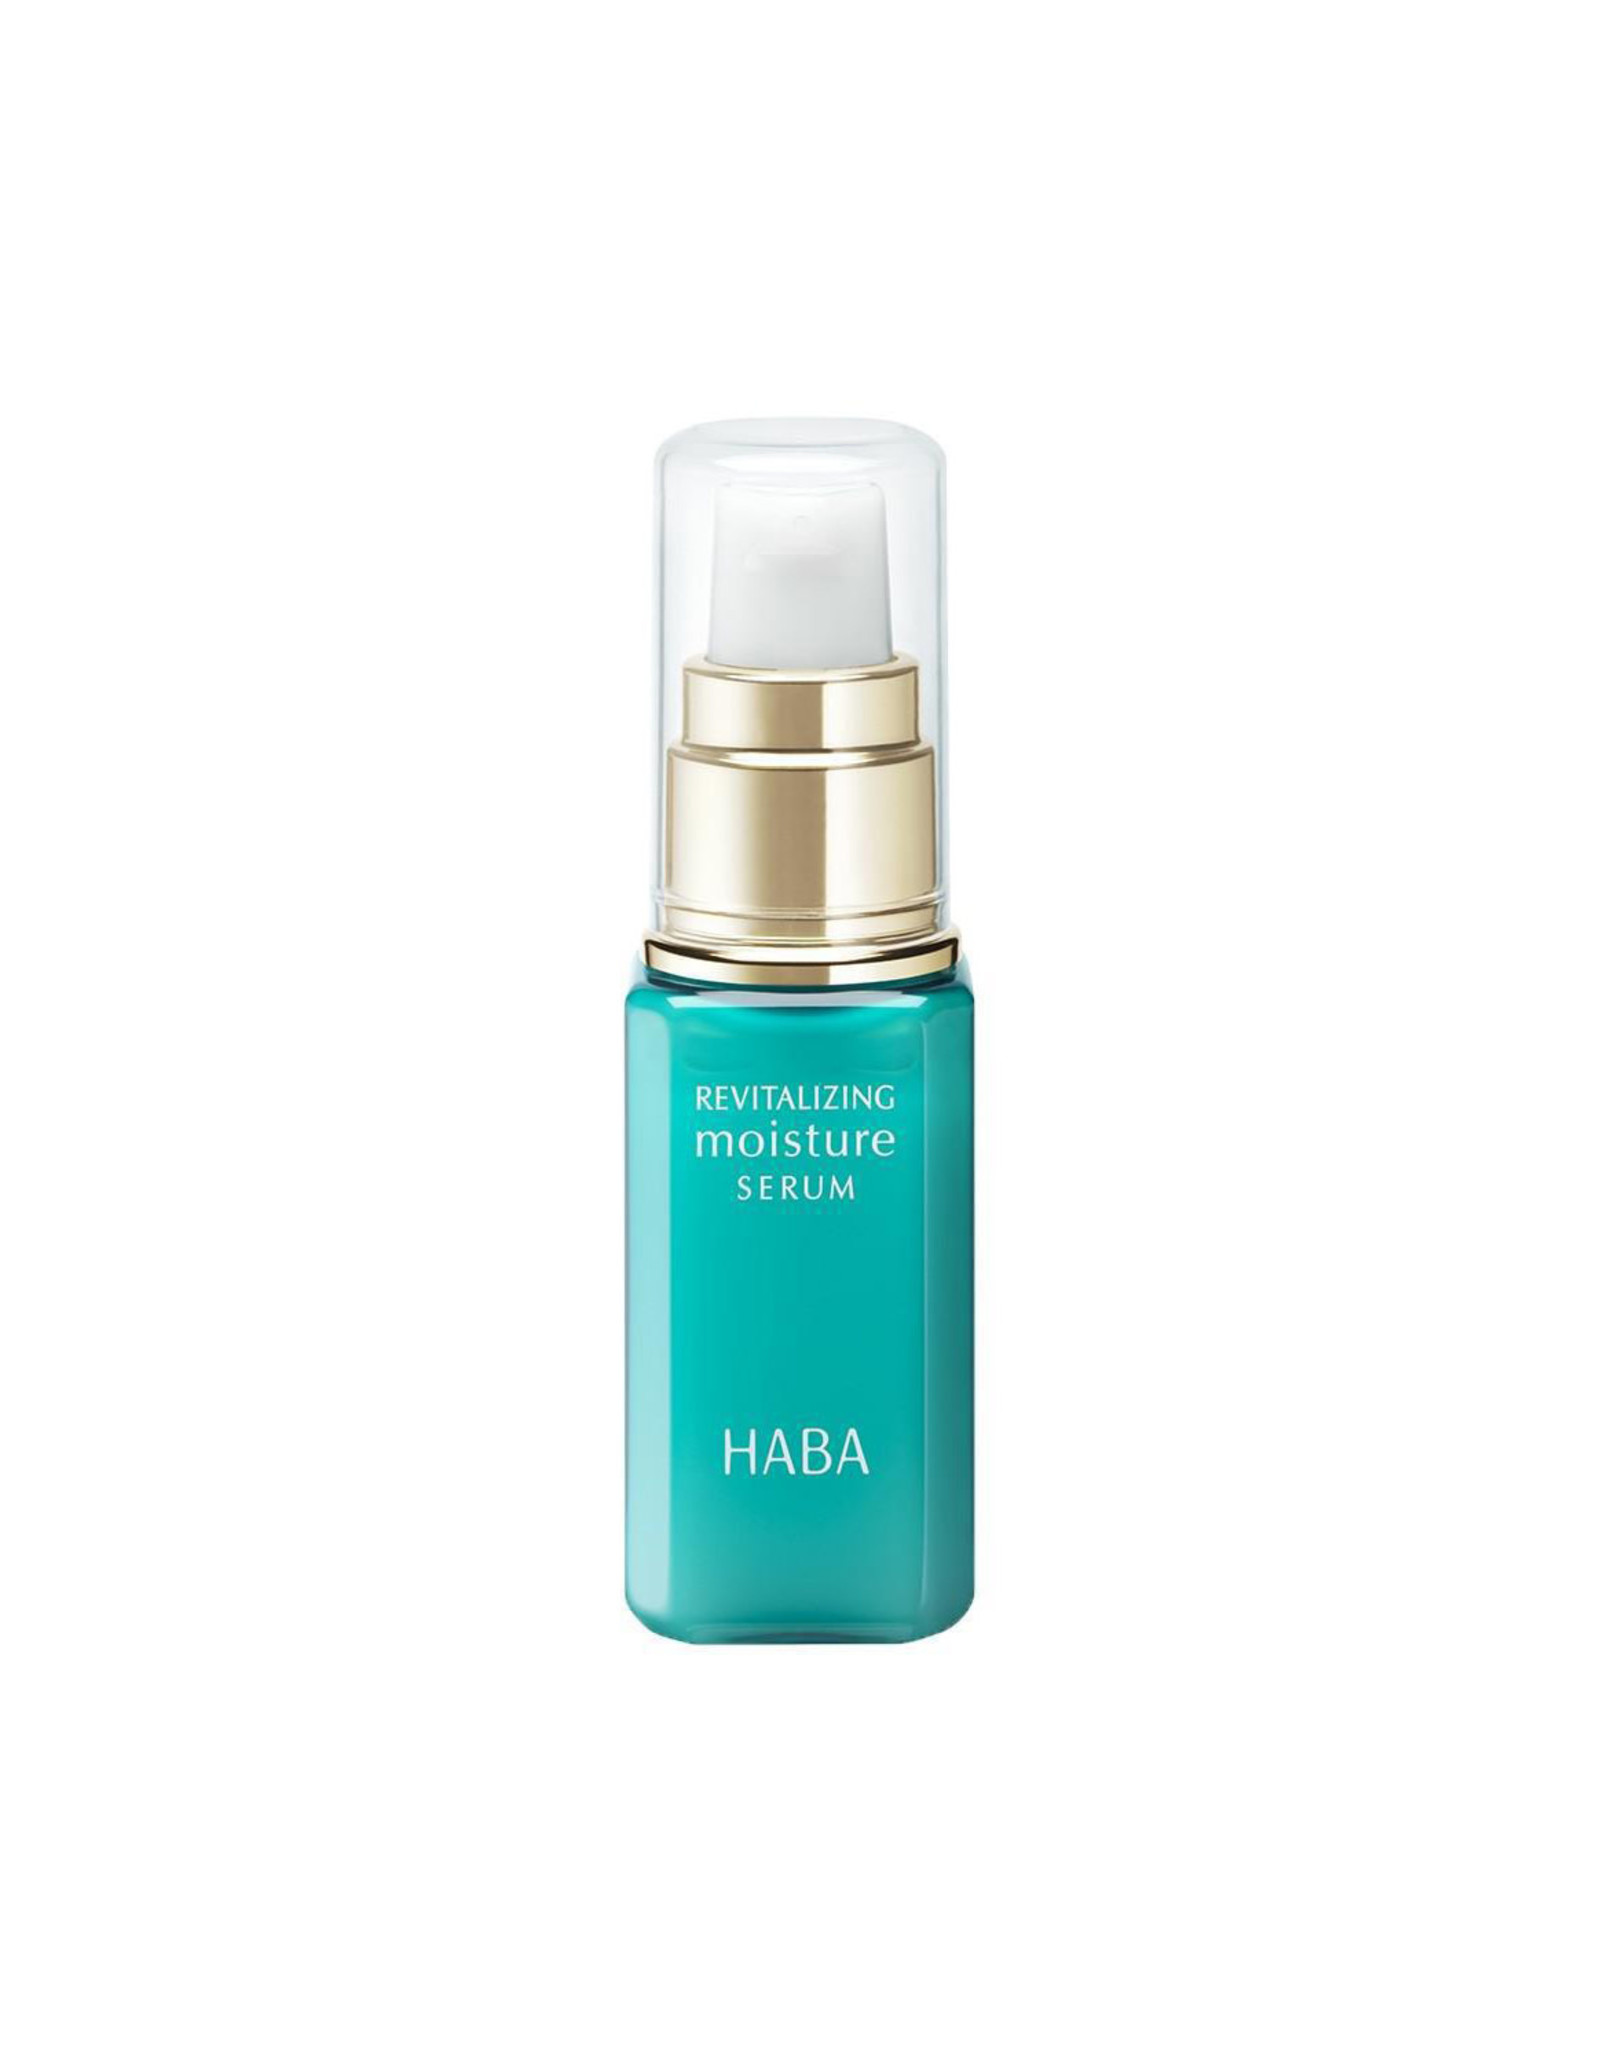 HABA Haba Revitalizing Moisture Serum